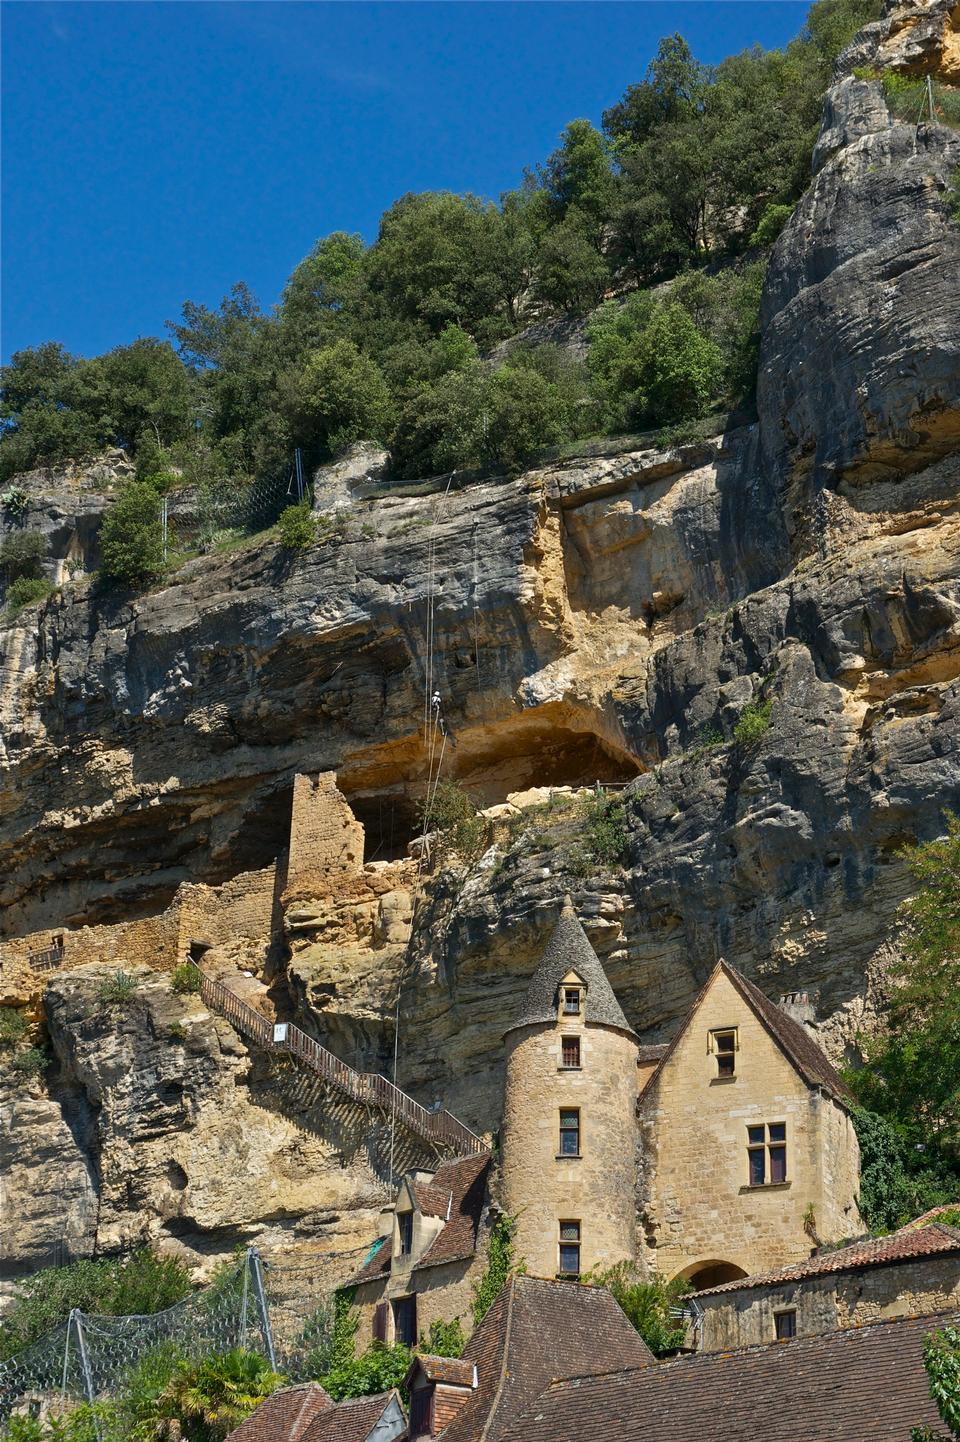 Free Photos: Dordogne, Aquitaine, France | eurosnap